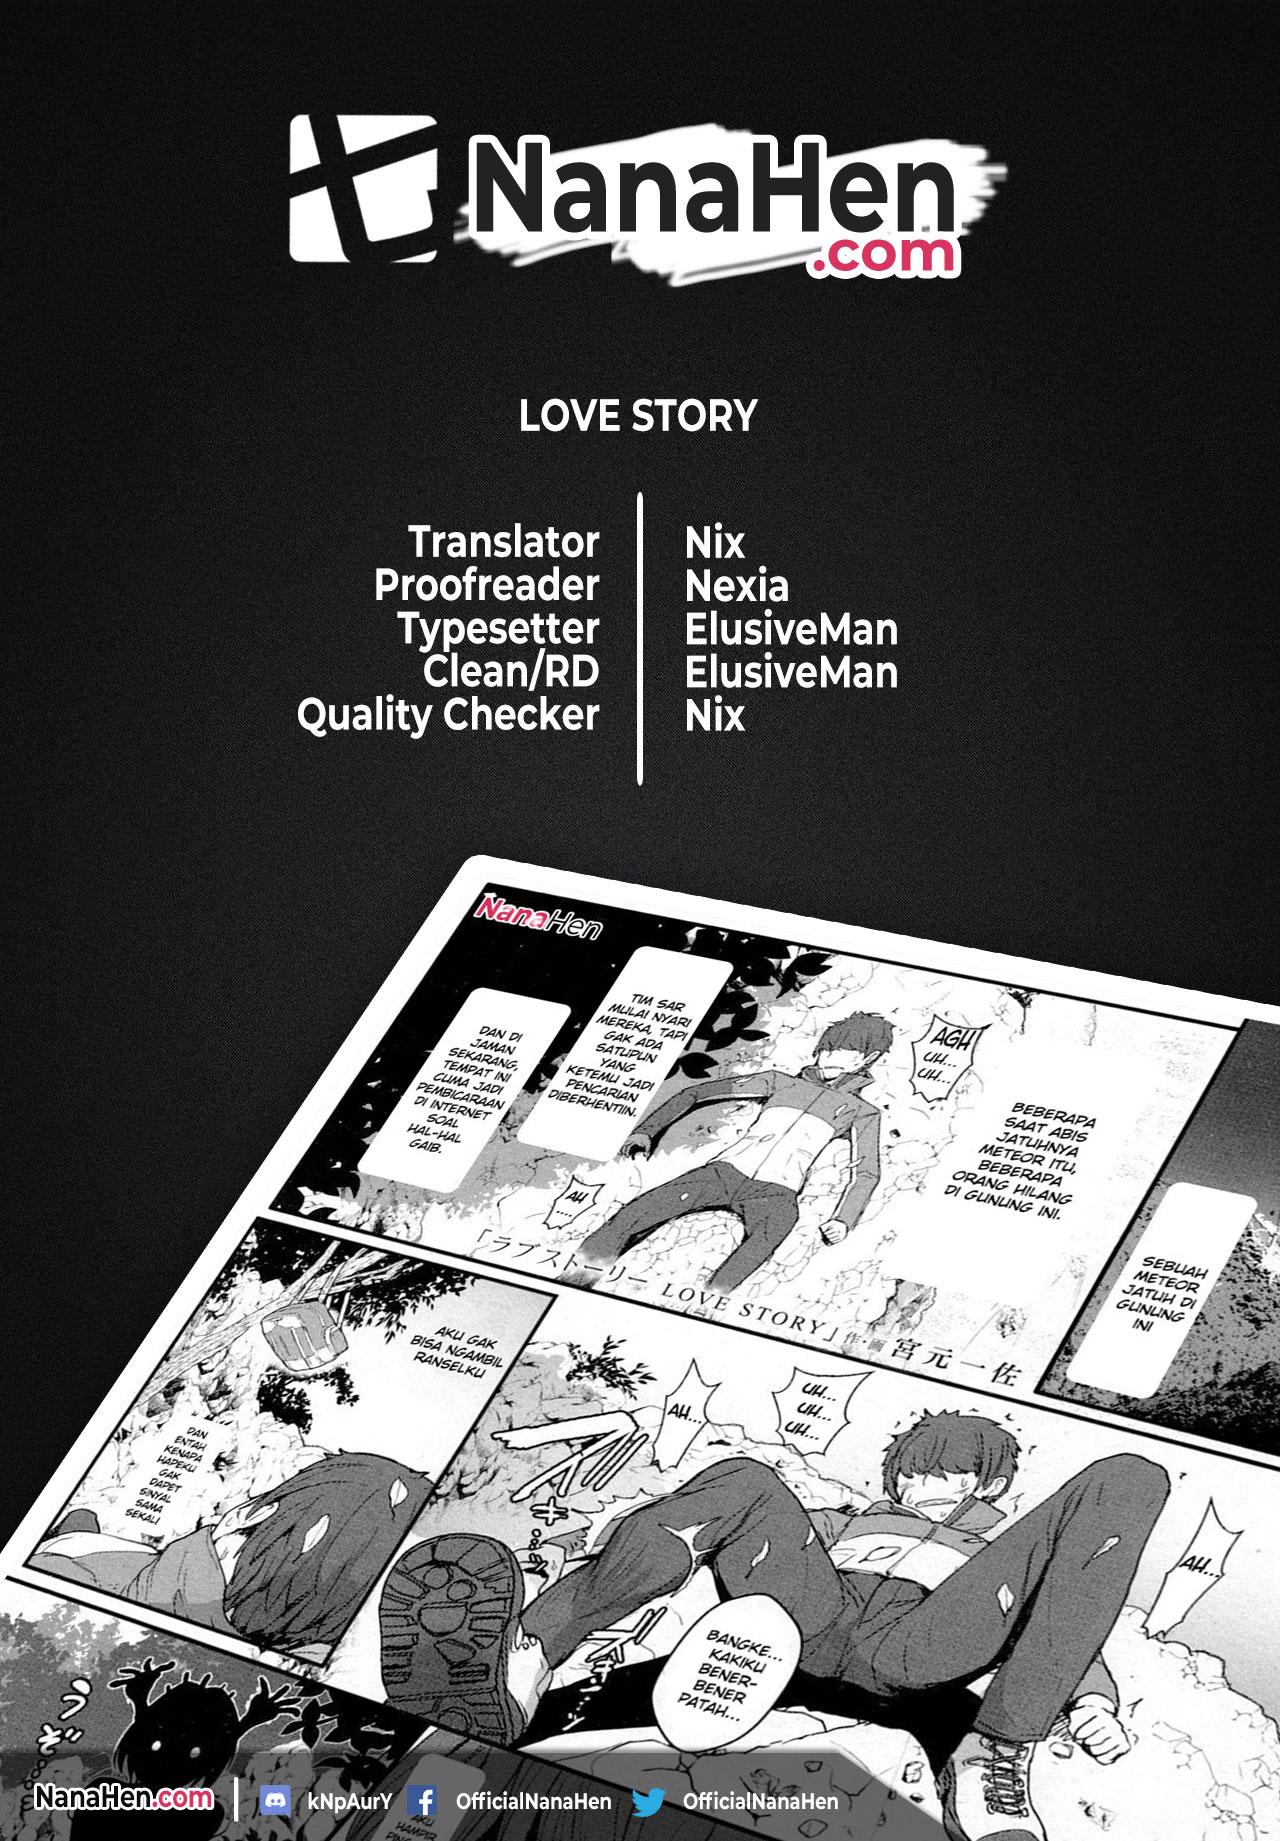 000-Cover-Nanahen